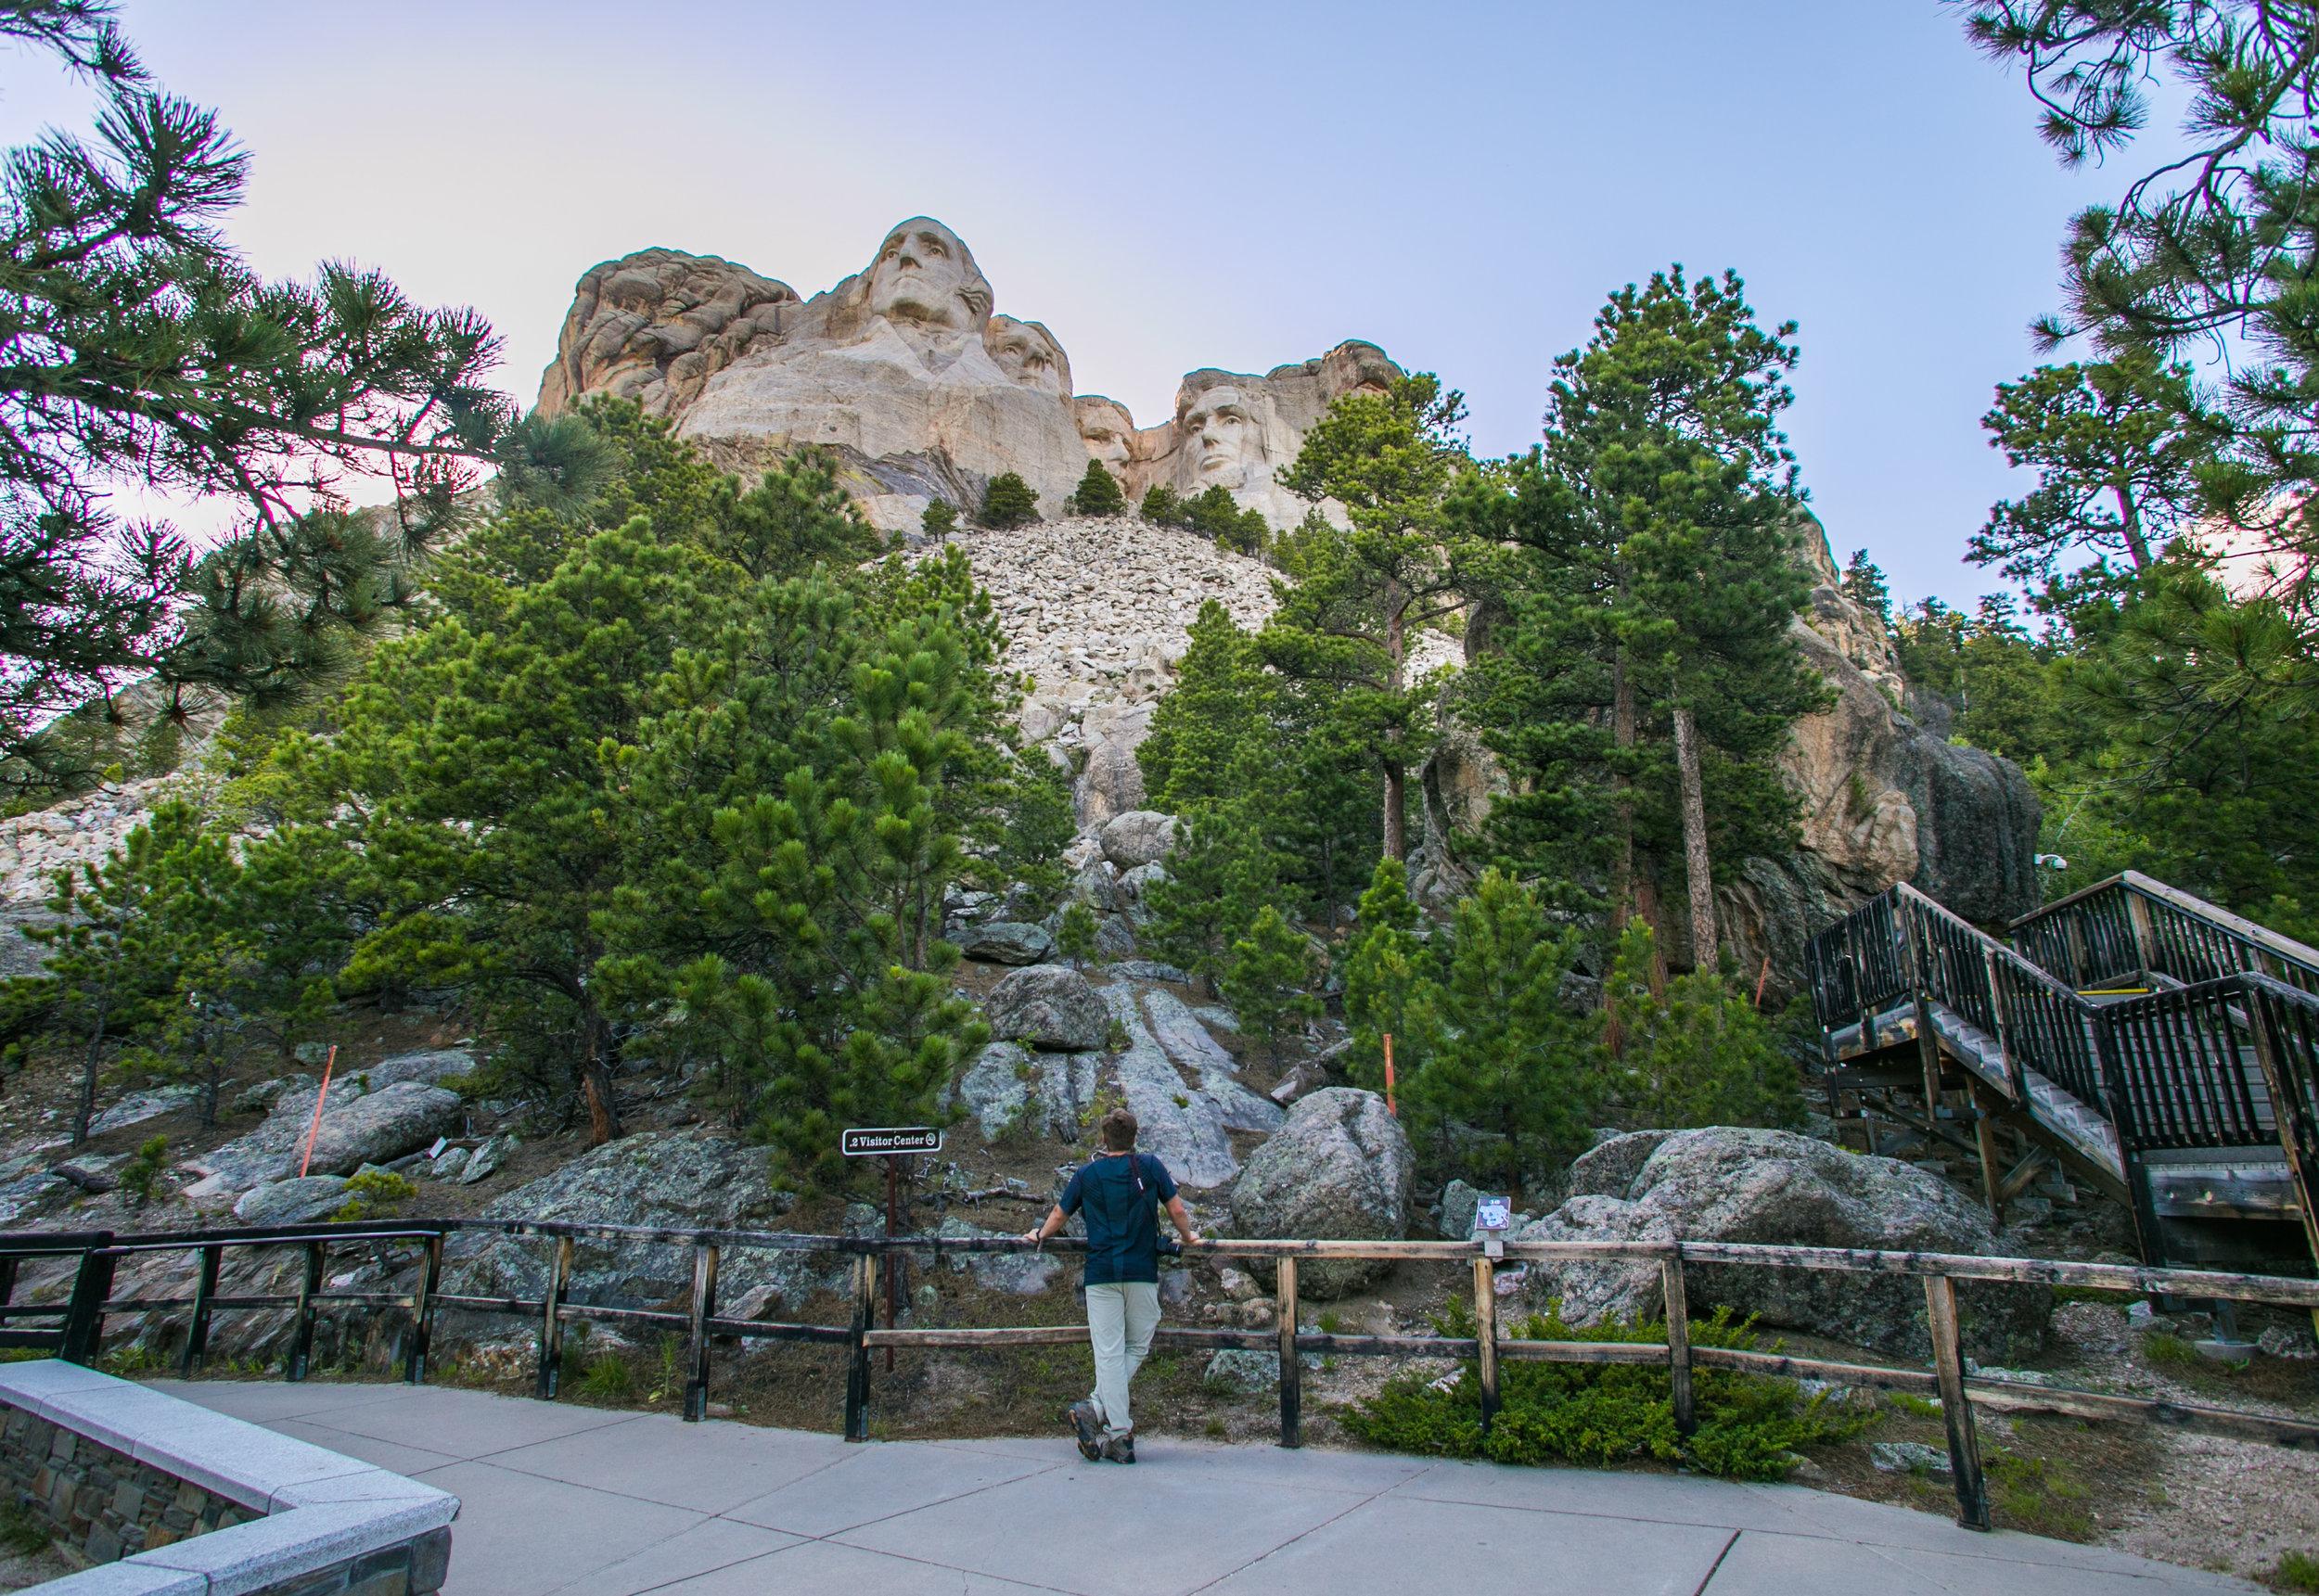 Mt. Rushmore - Black Hills, SD